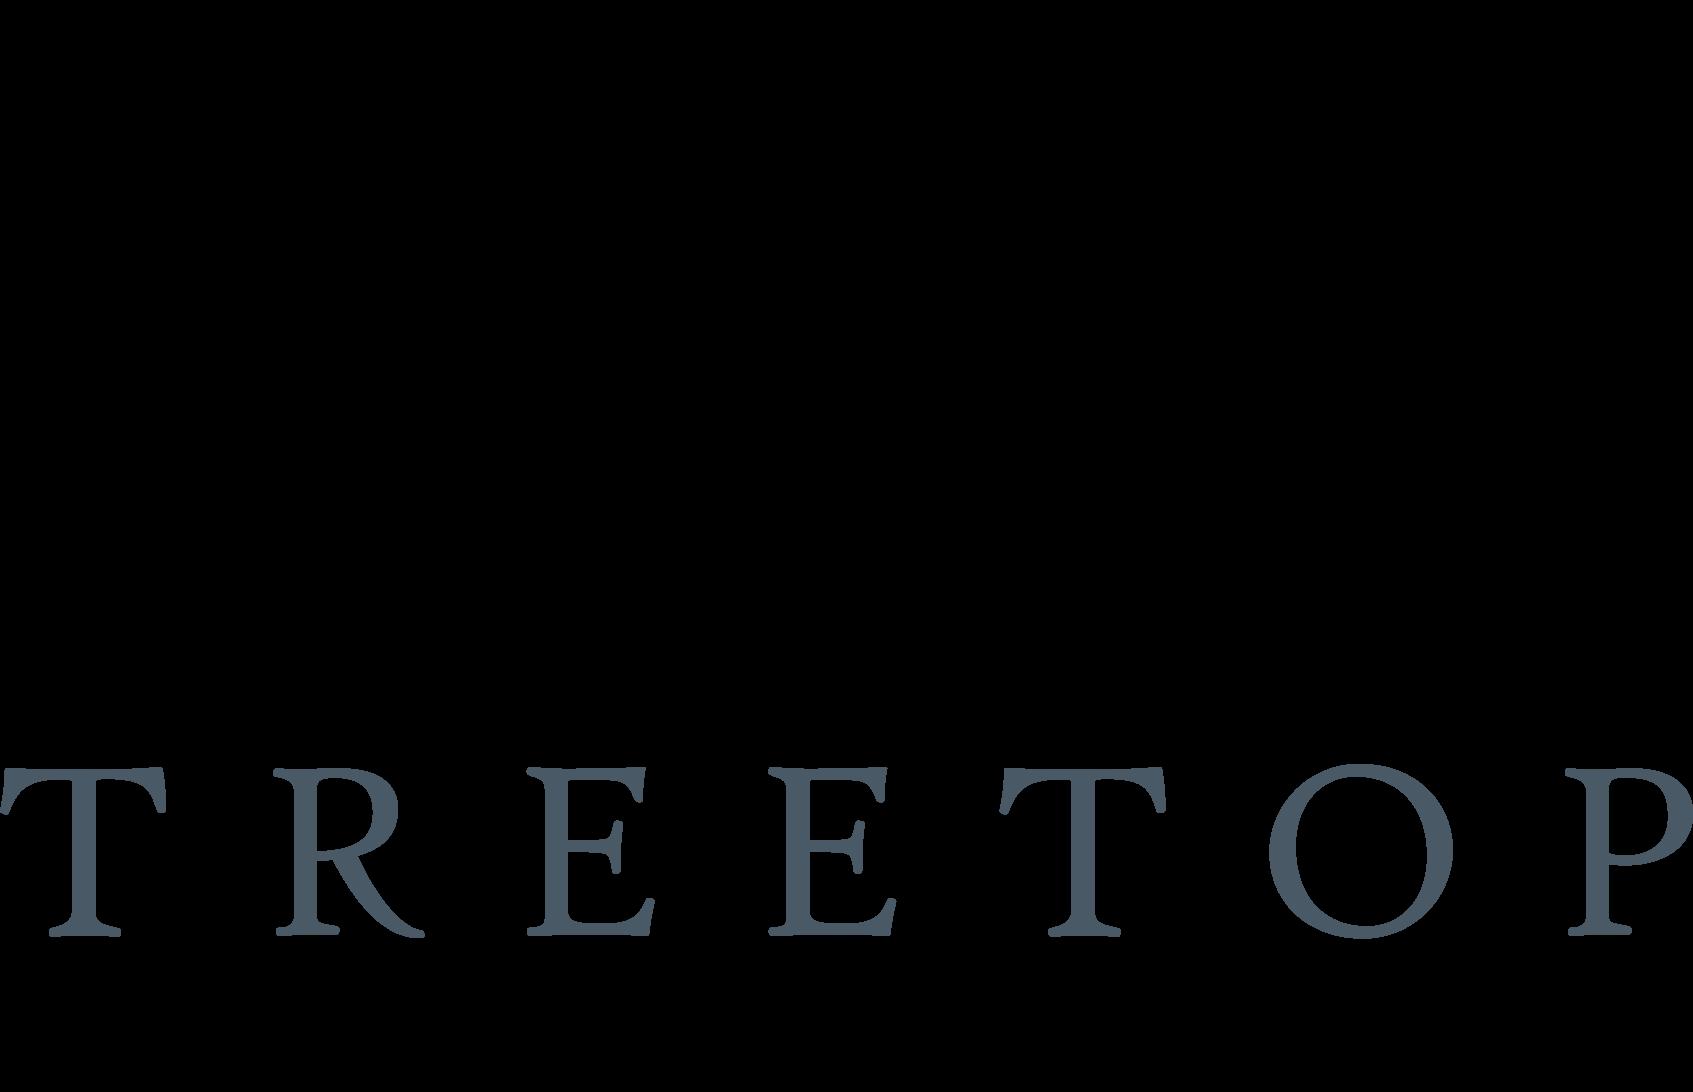 Treetop Logo (Dark)